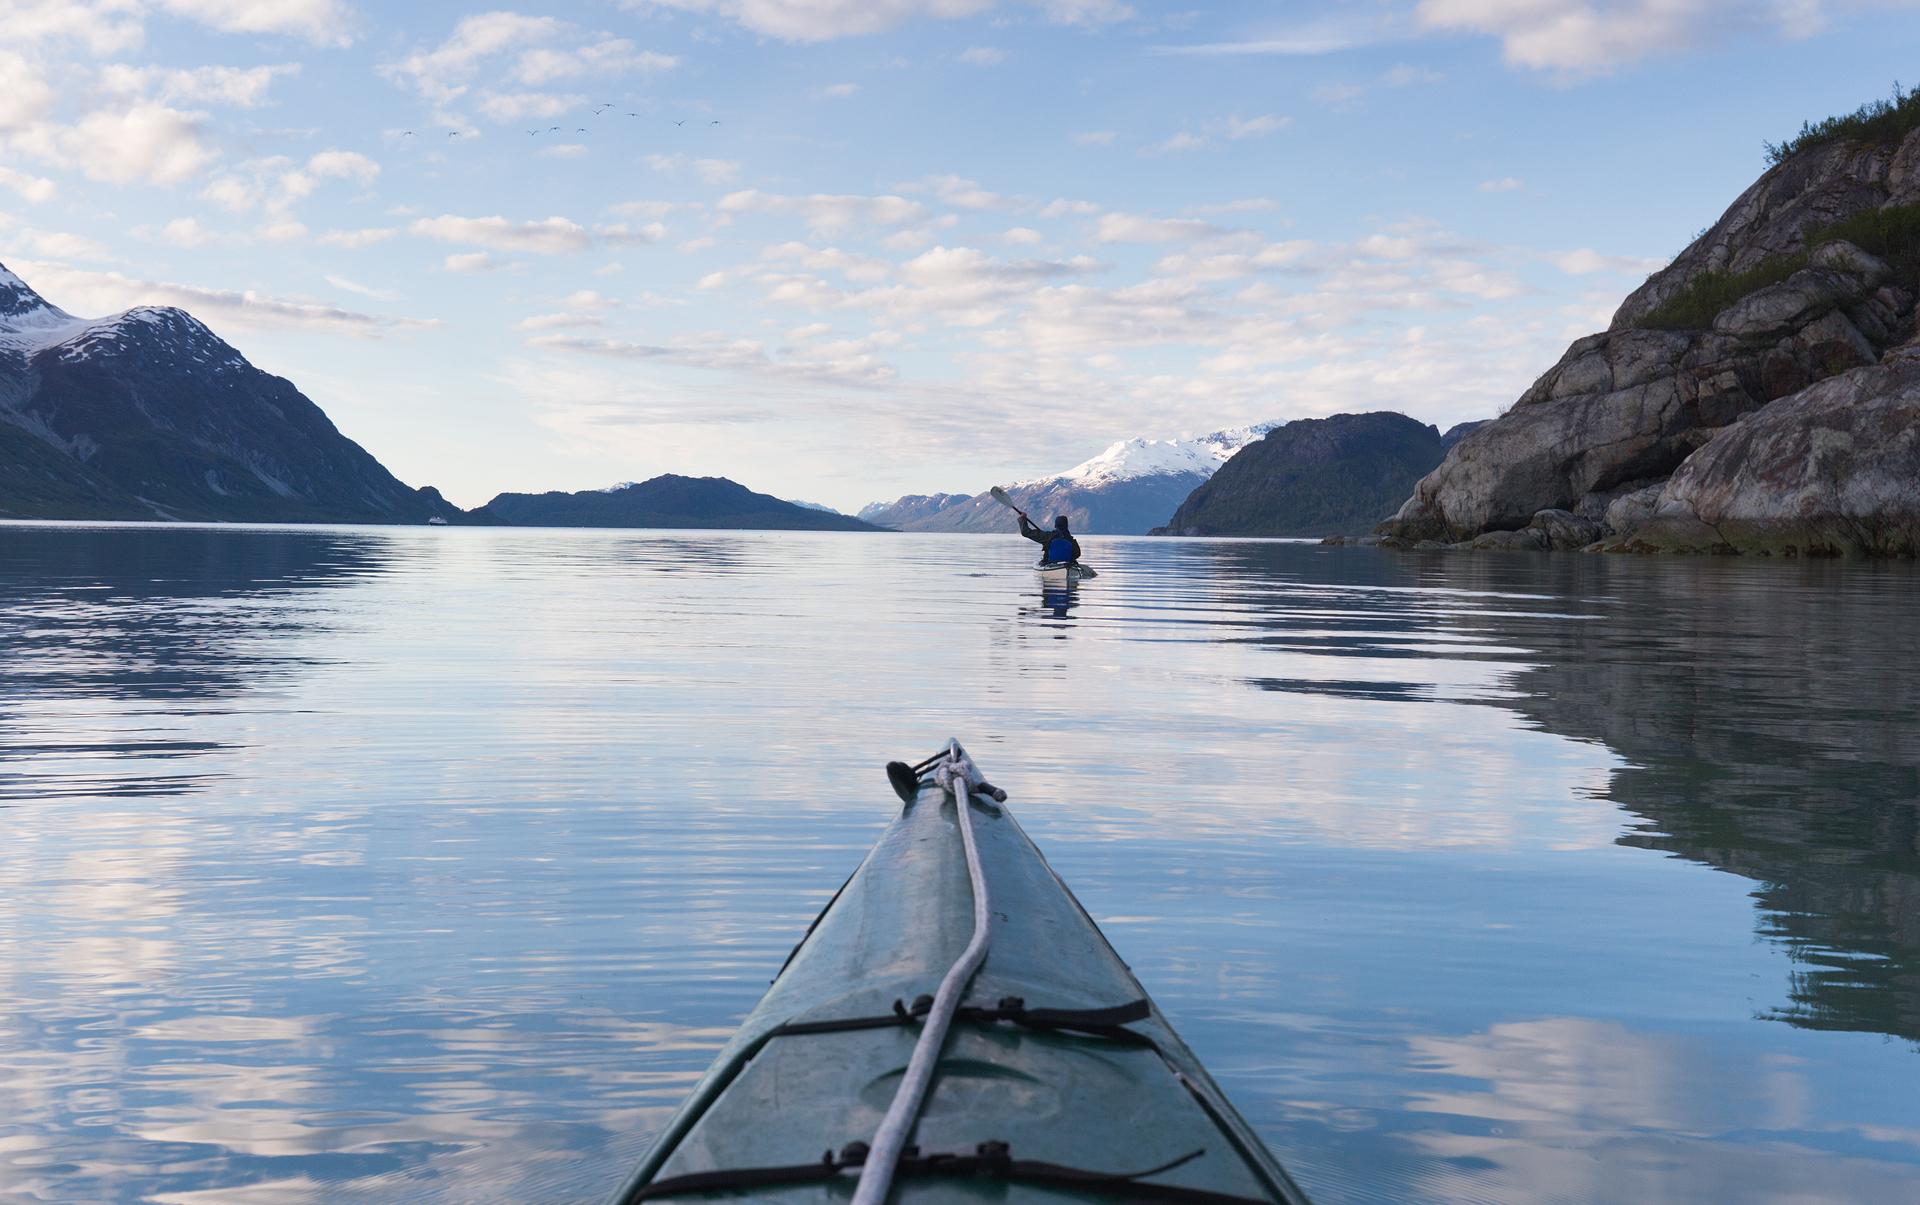 Paddling down the Tarr Inlet at ~6am